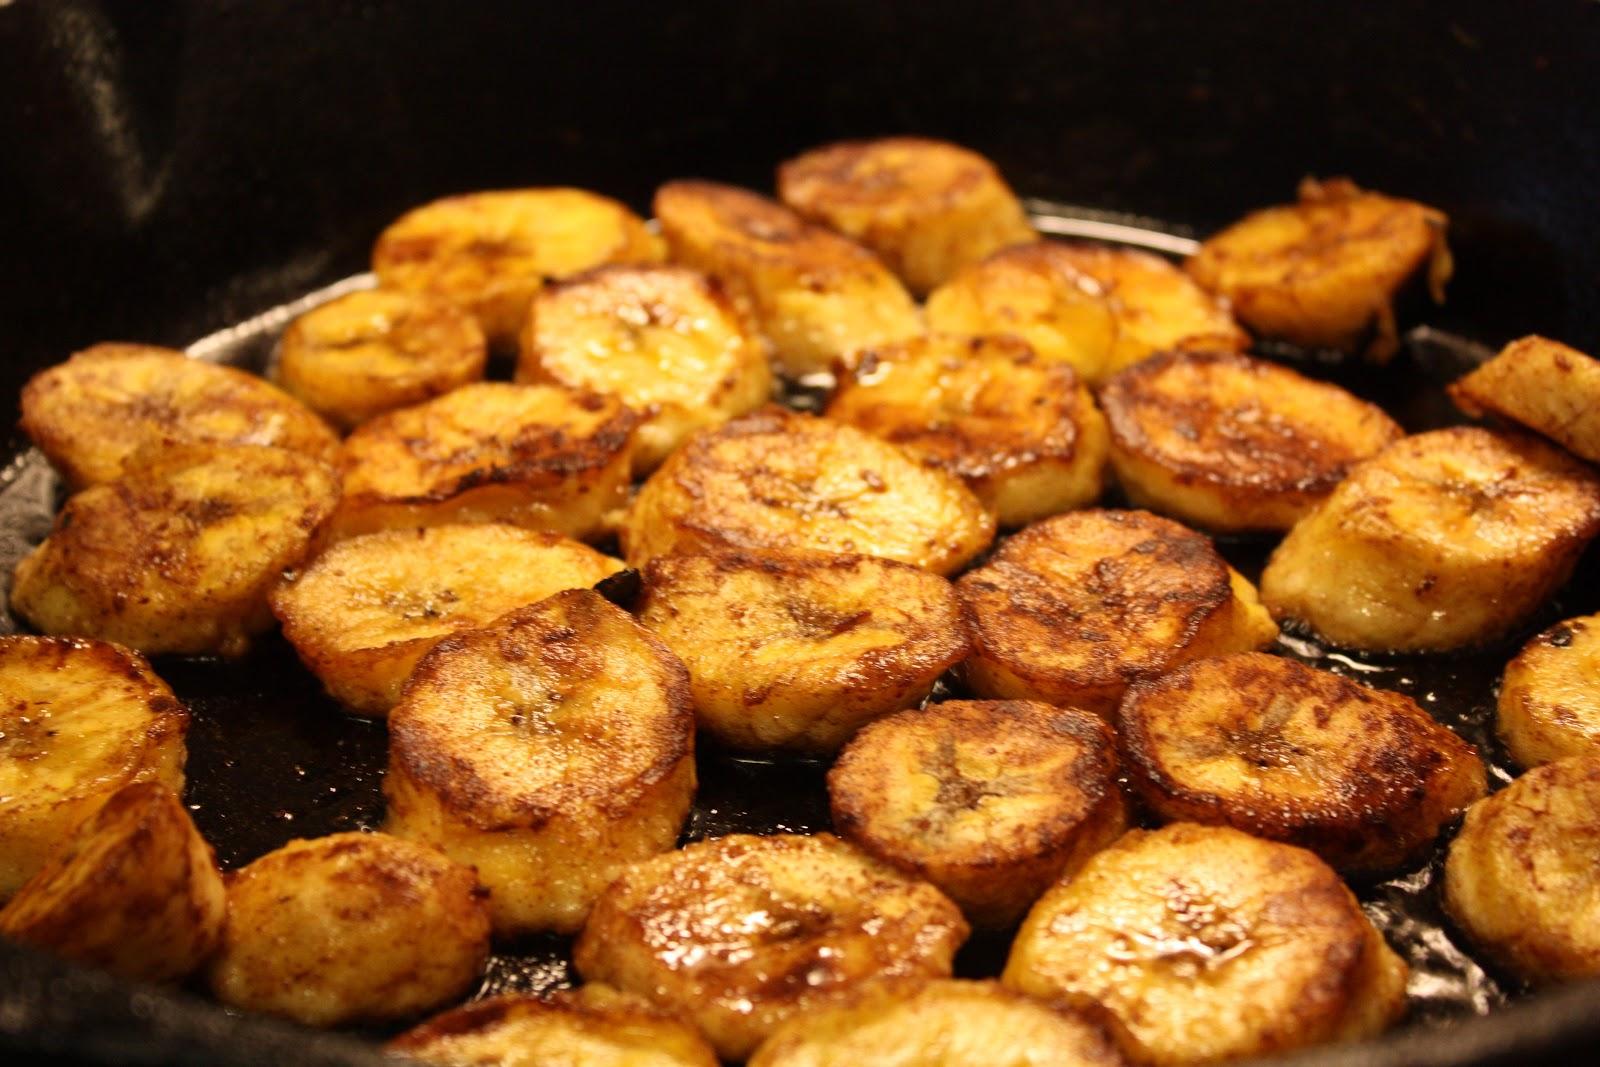 plantains2.jpg